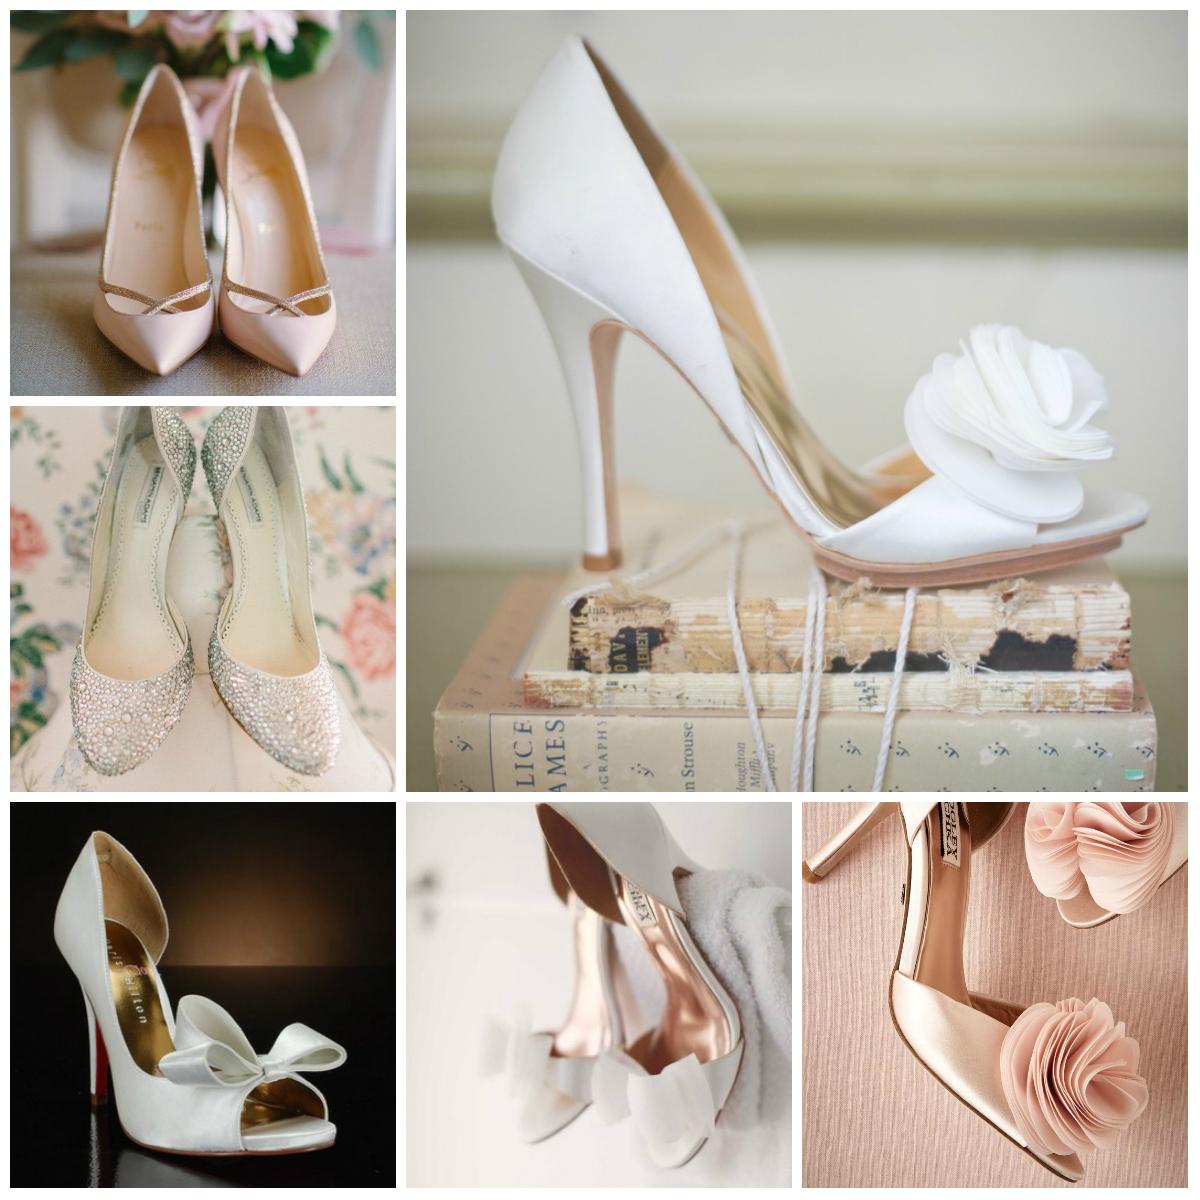 Туфли на свадьбу 2018 фото